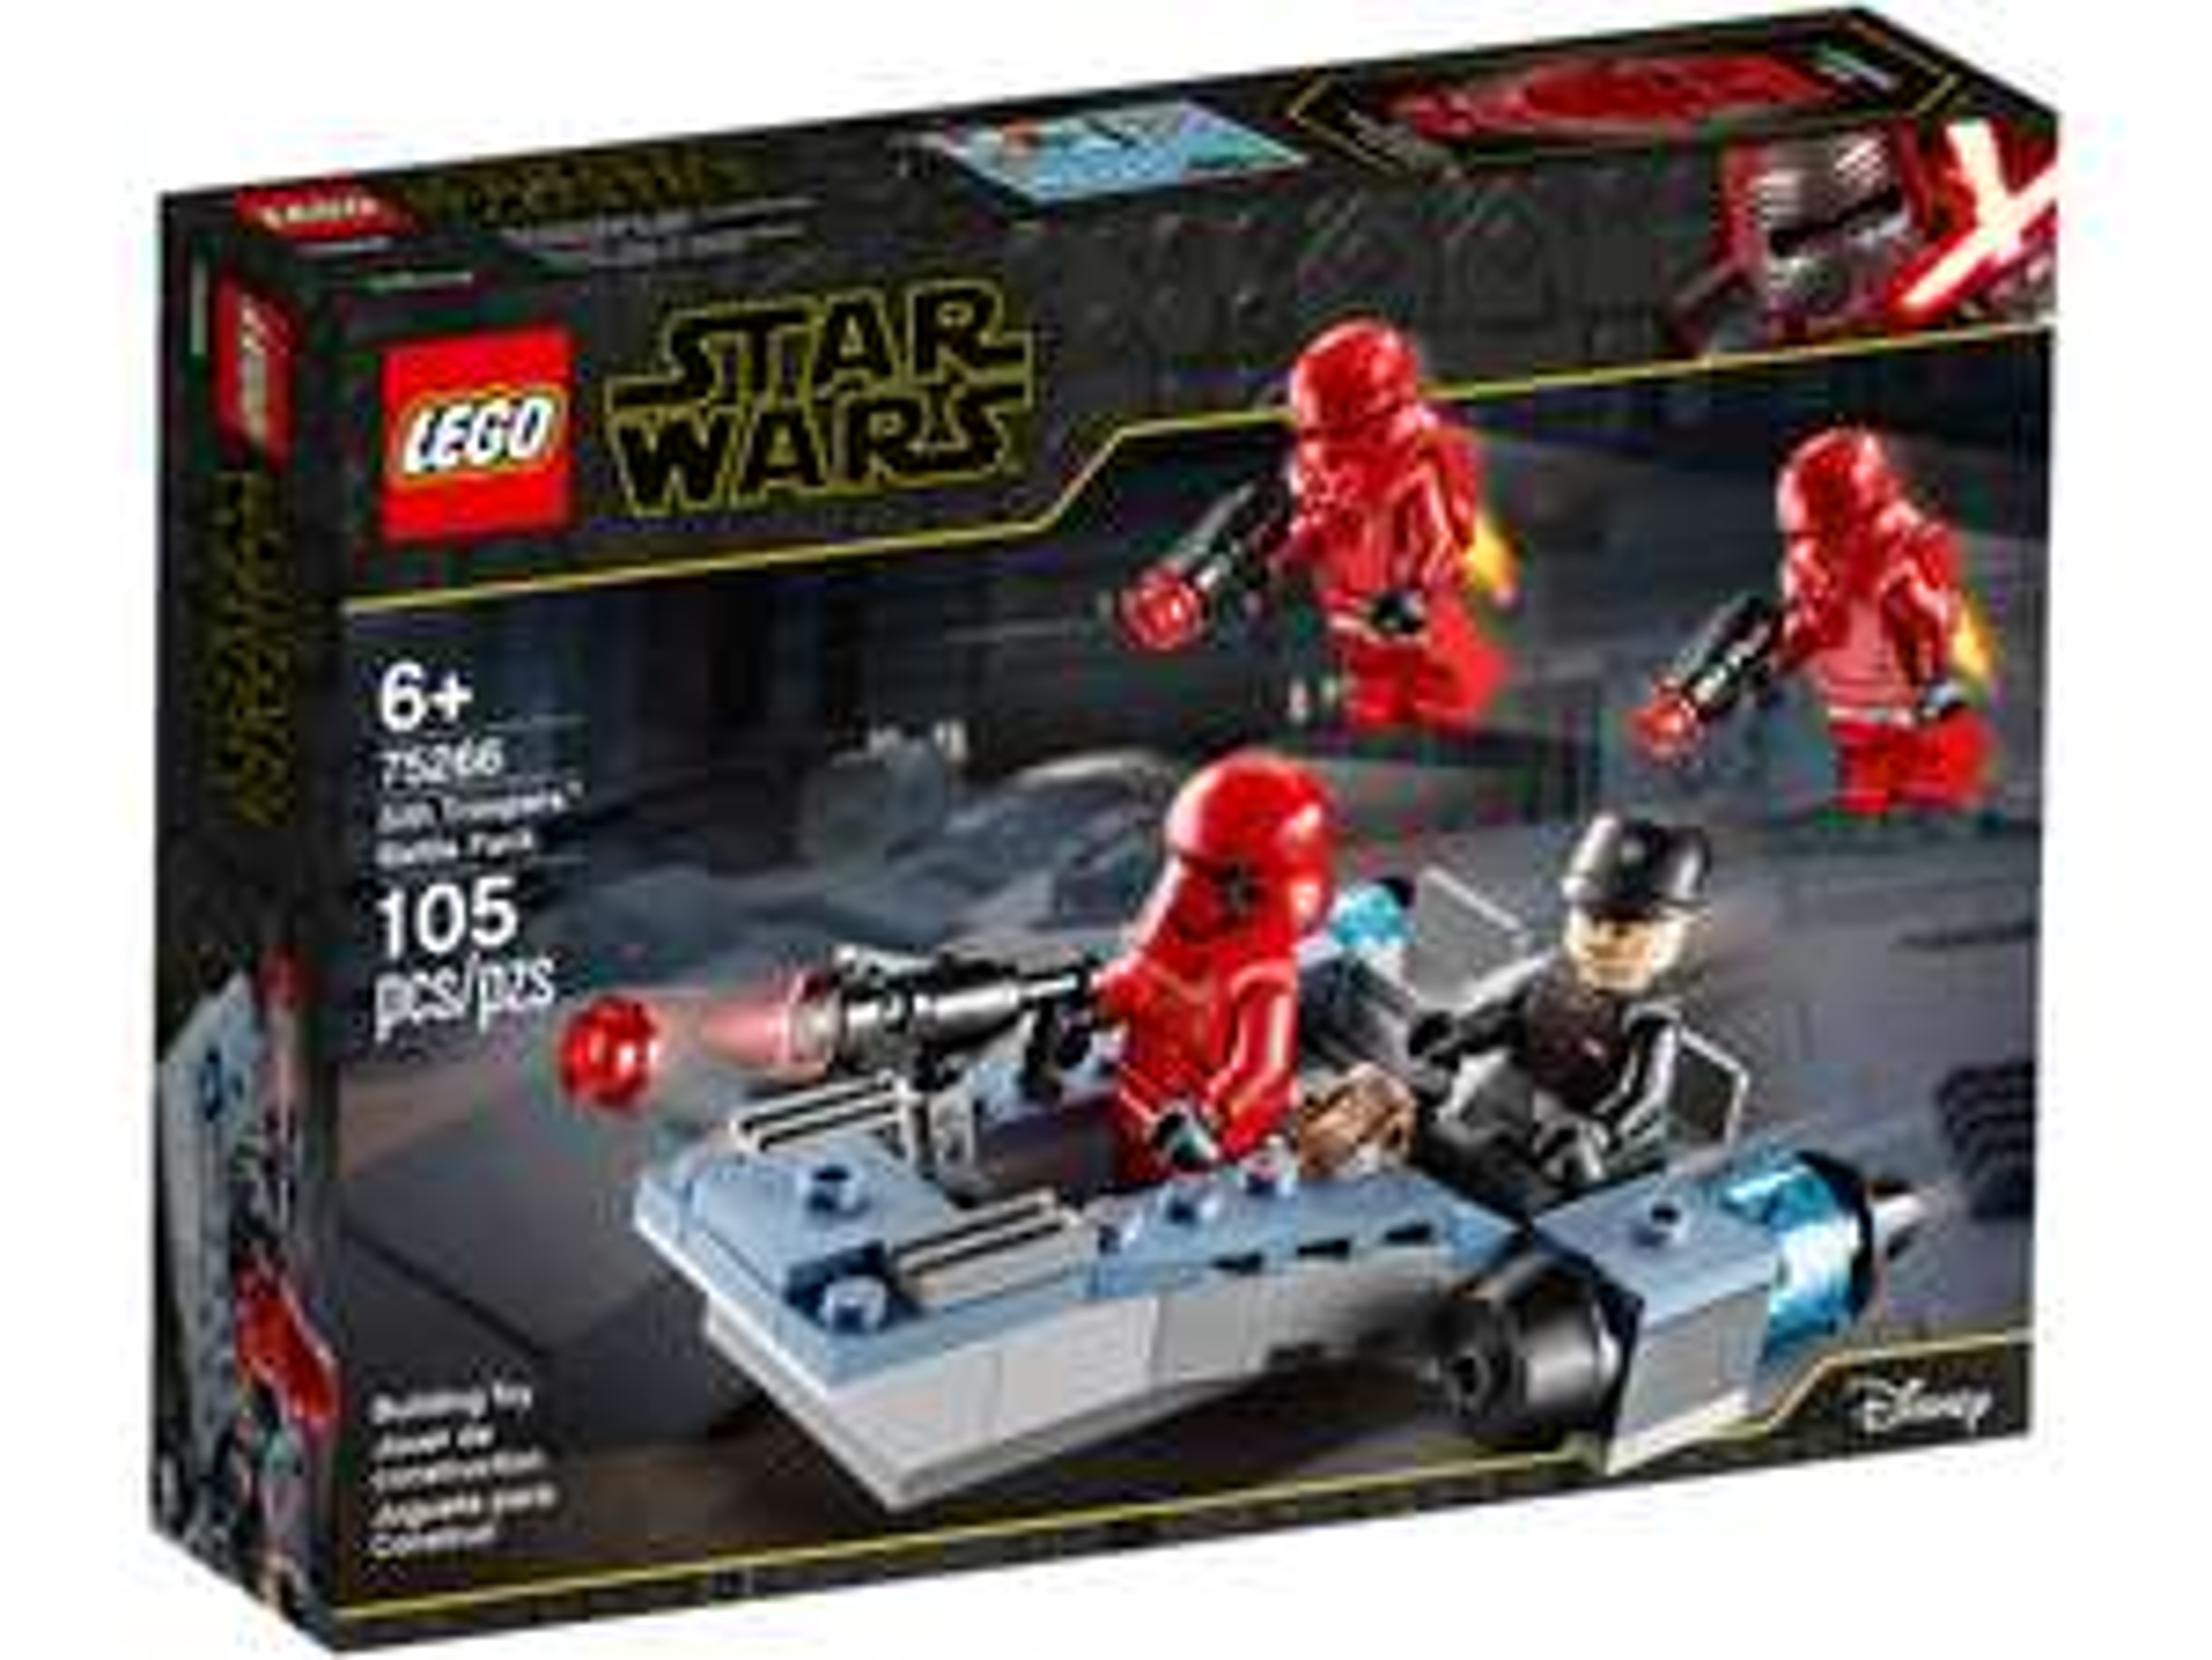 Lego Star Wars battle packs £11.99 at Lidl (Both Sith Trooper and Mandalorian battle packs)